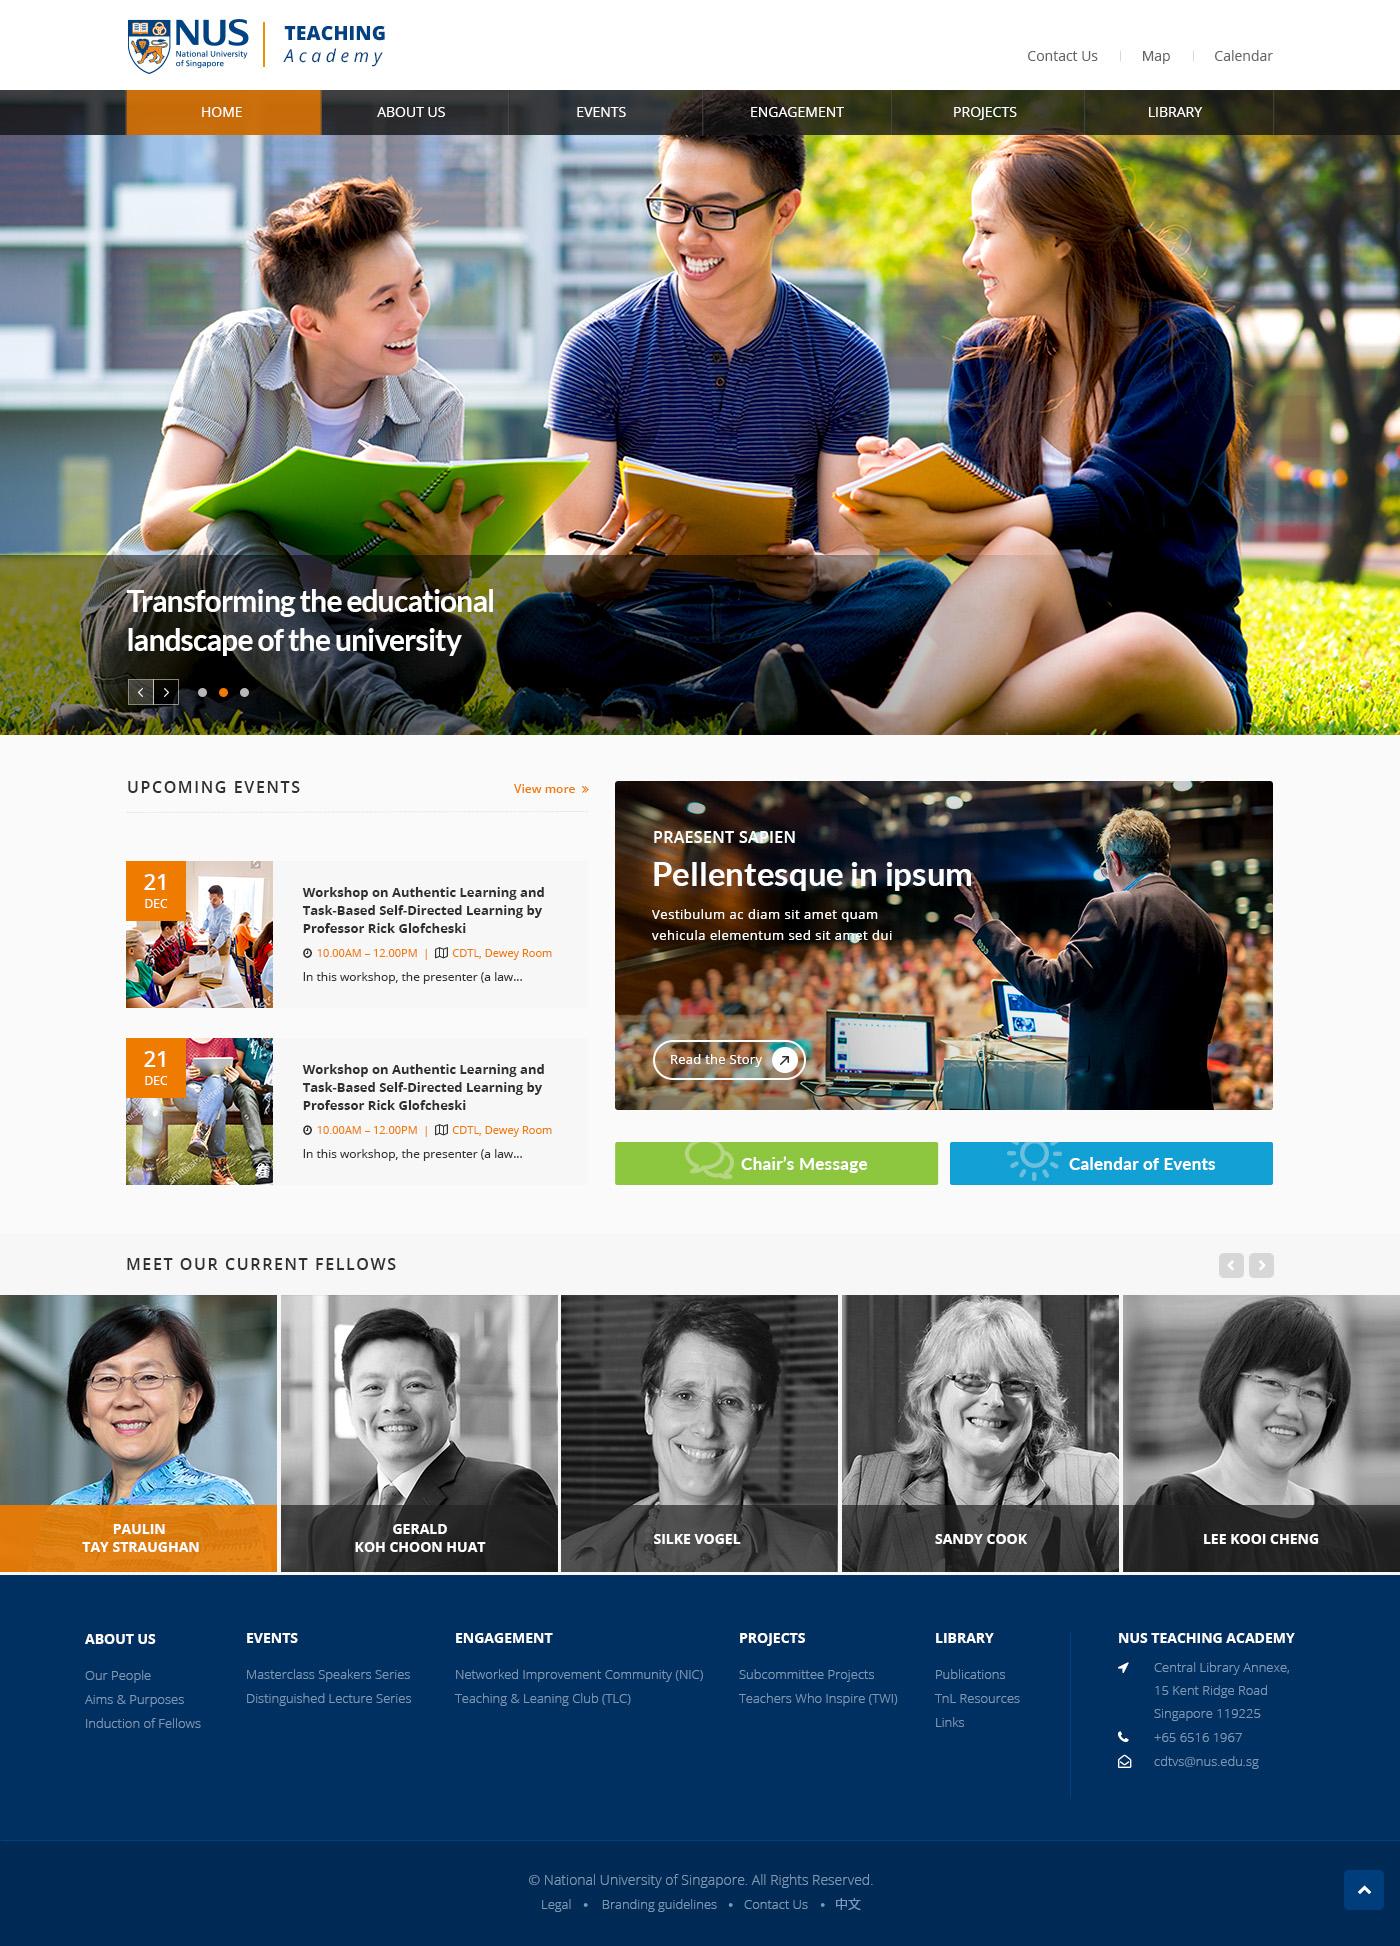 Nus Teaching Academy Web Design Philippines Website Design Web Development Company Web Design Philippines Website Design Web Development Company